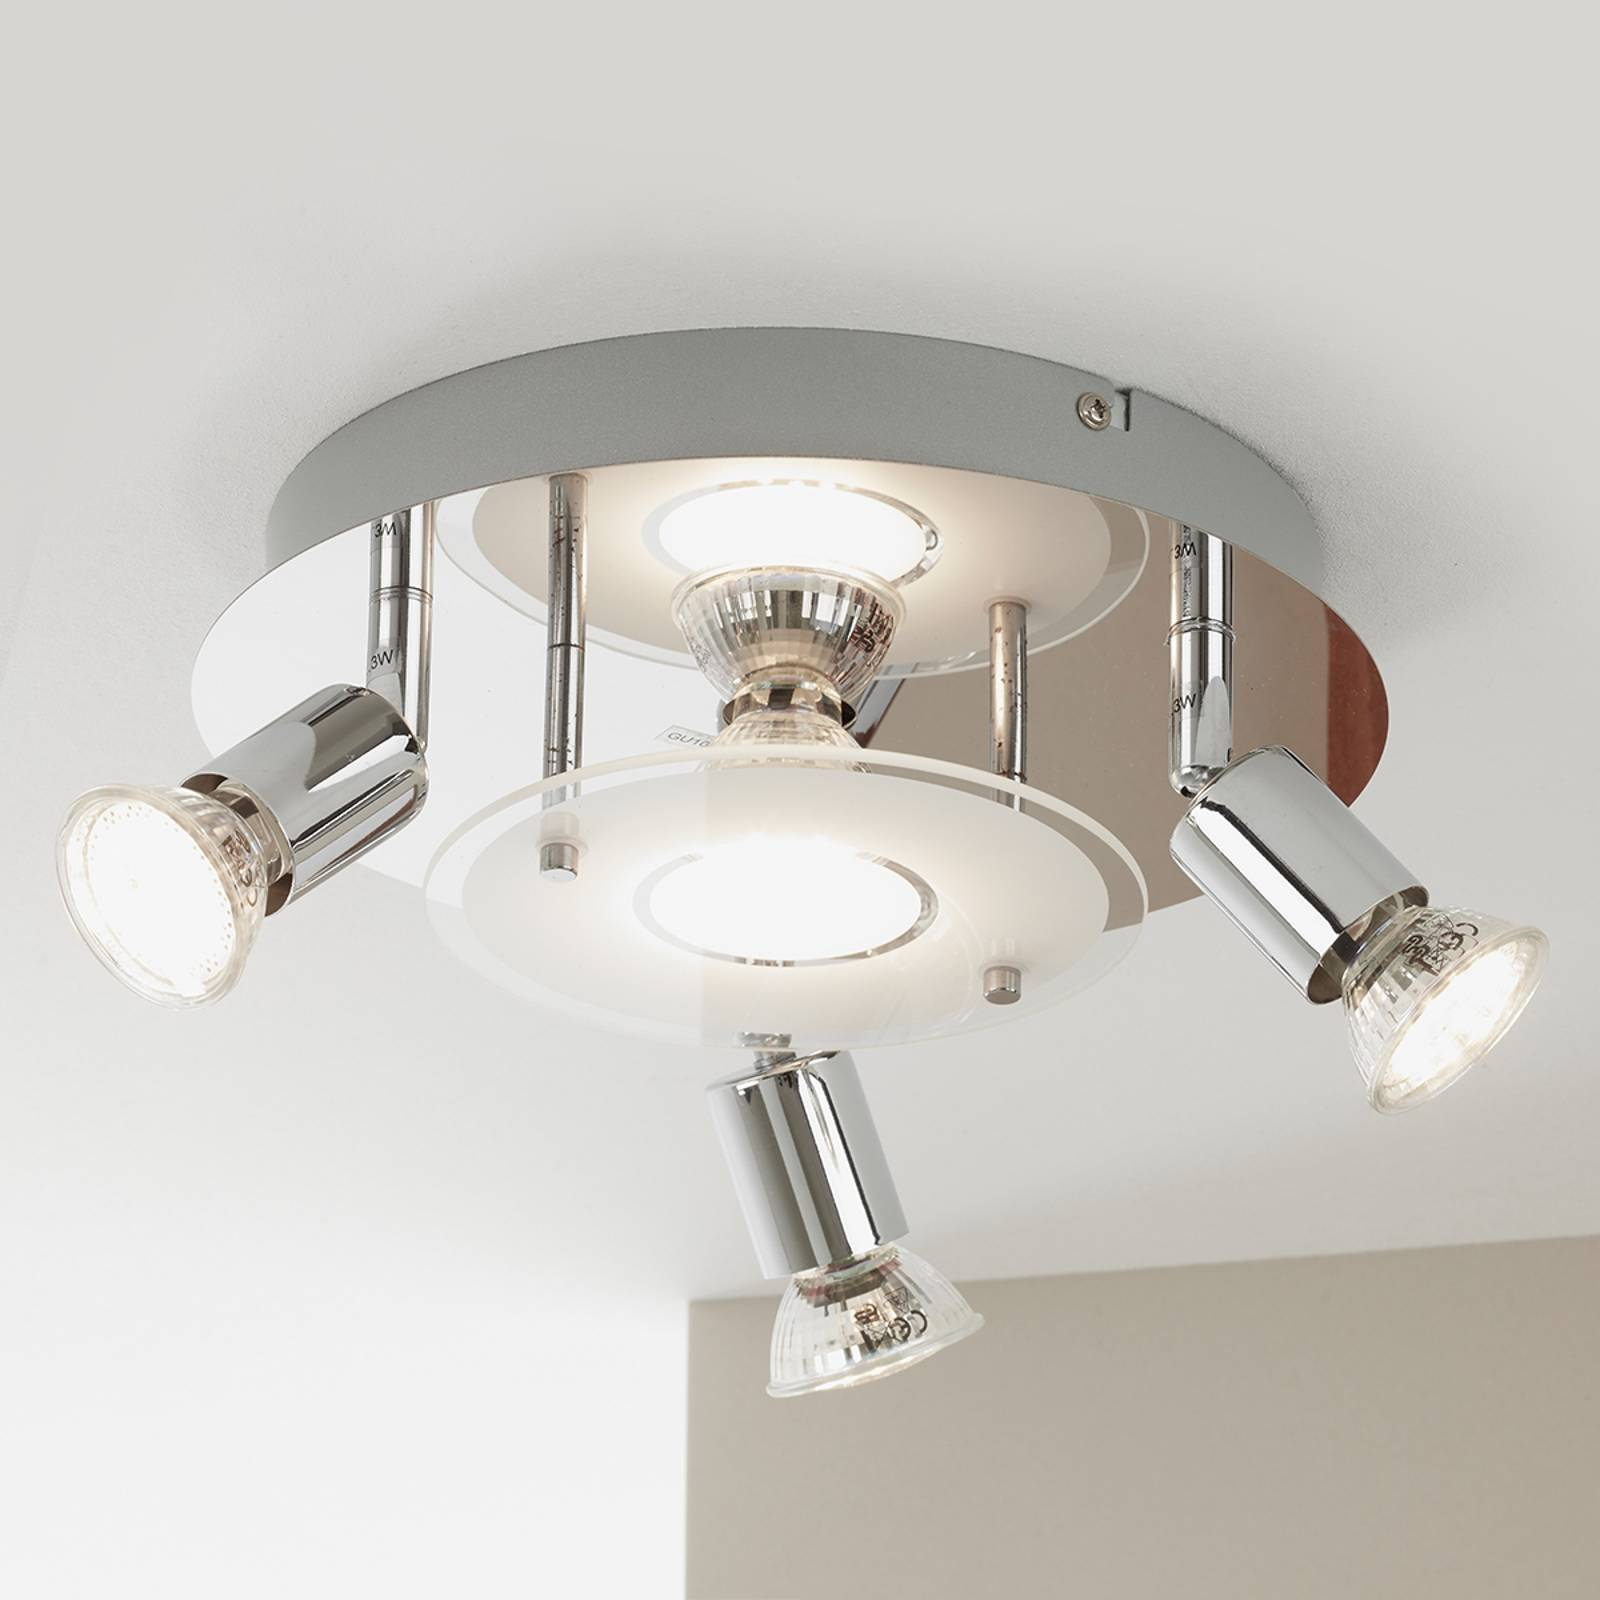 LED plafondlamp Start, 4-lamps